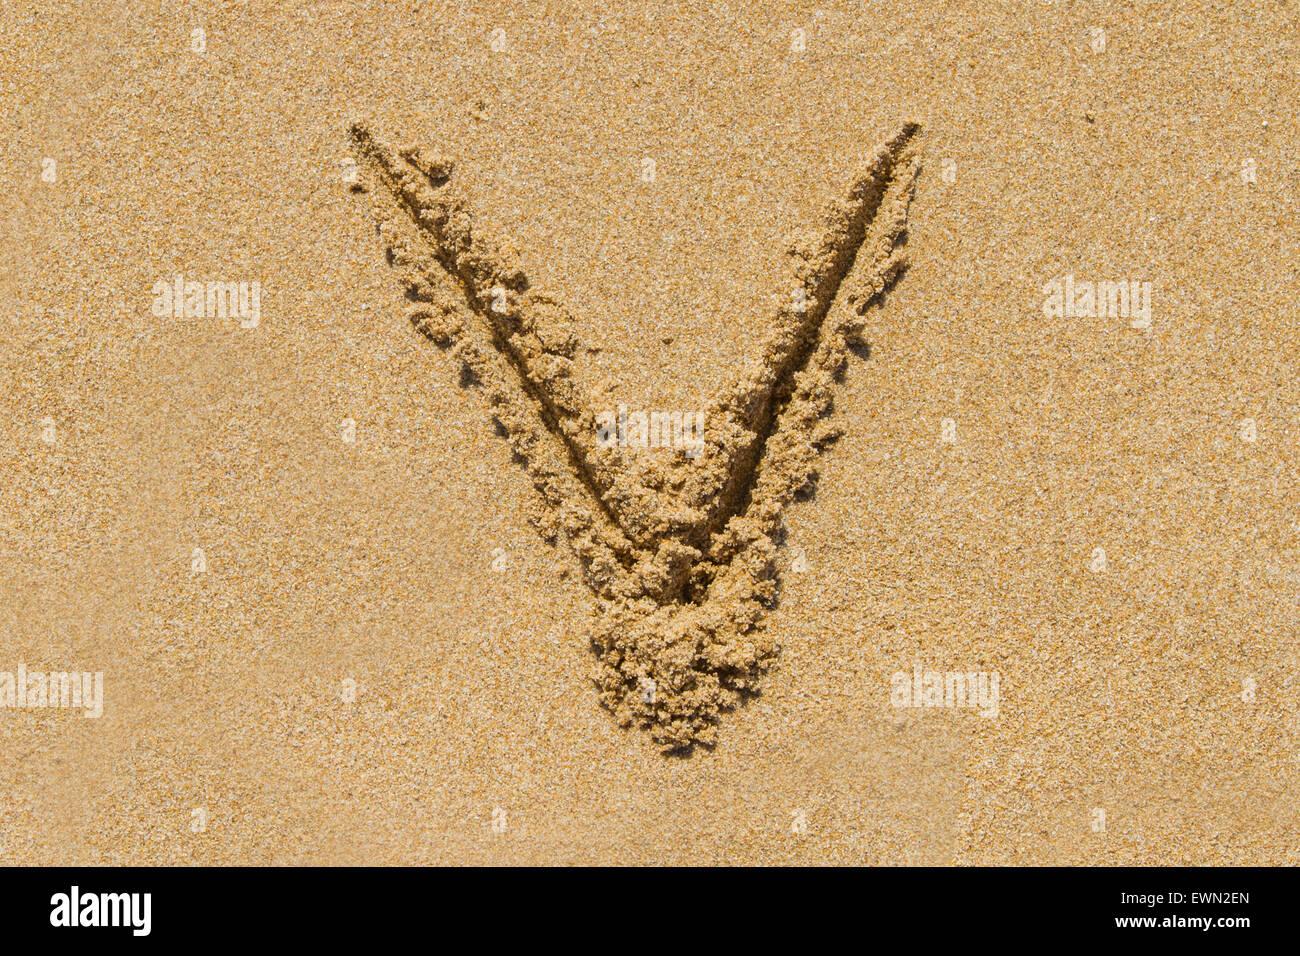 Letter V of the alphabet written on sand with upper case. - Stock Image